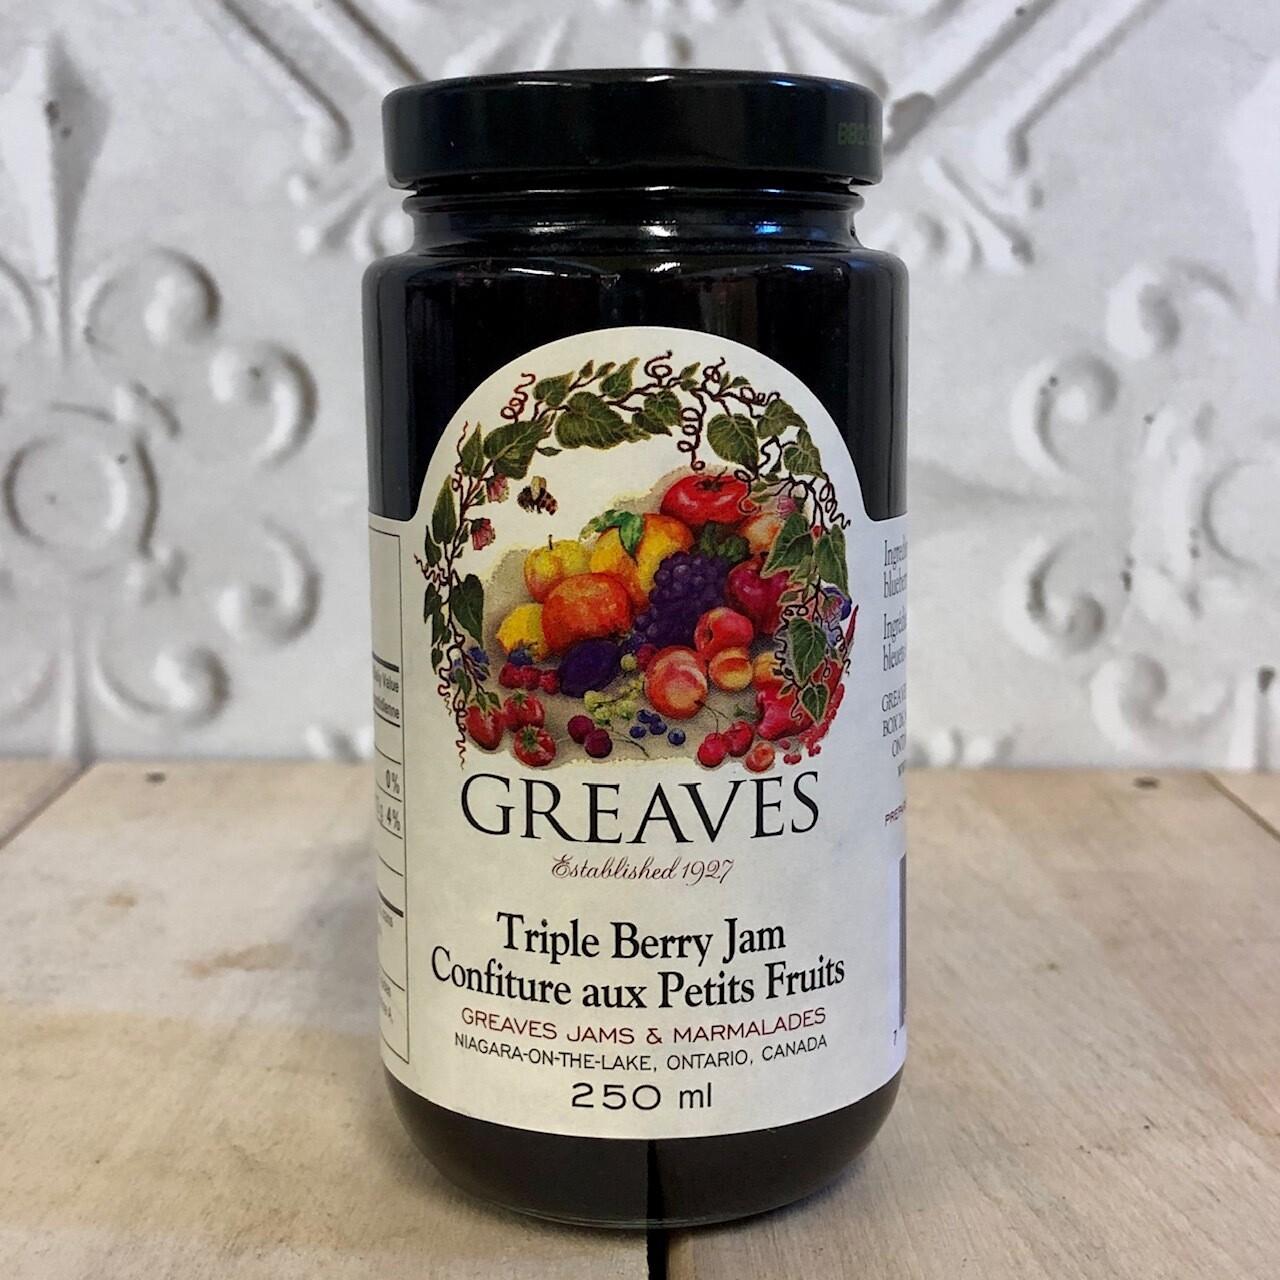 GREAVES Triple Berry Jam 250ml